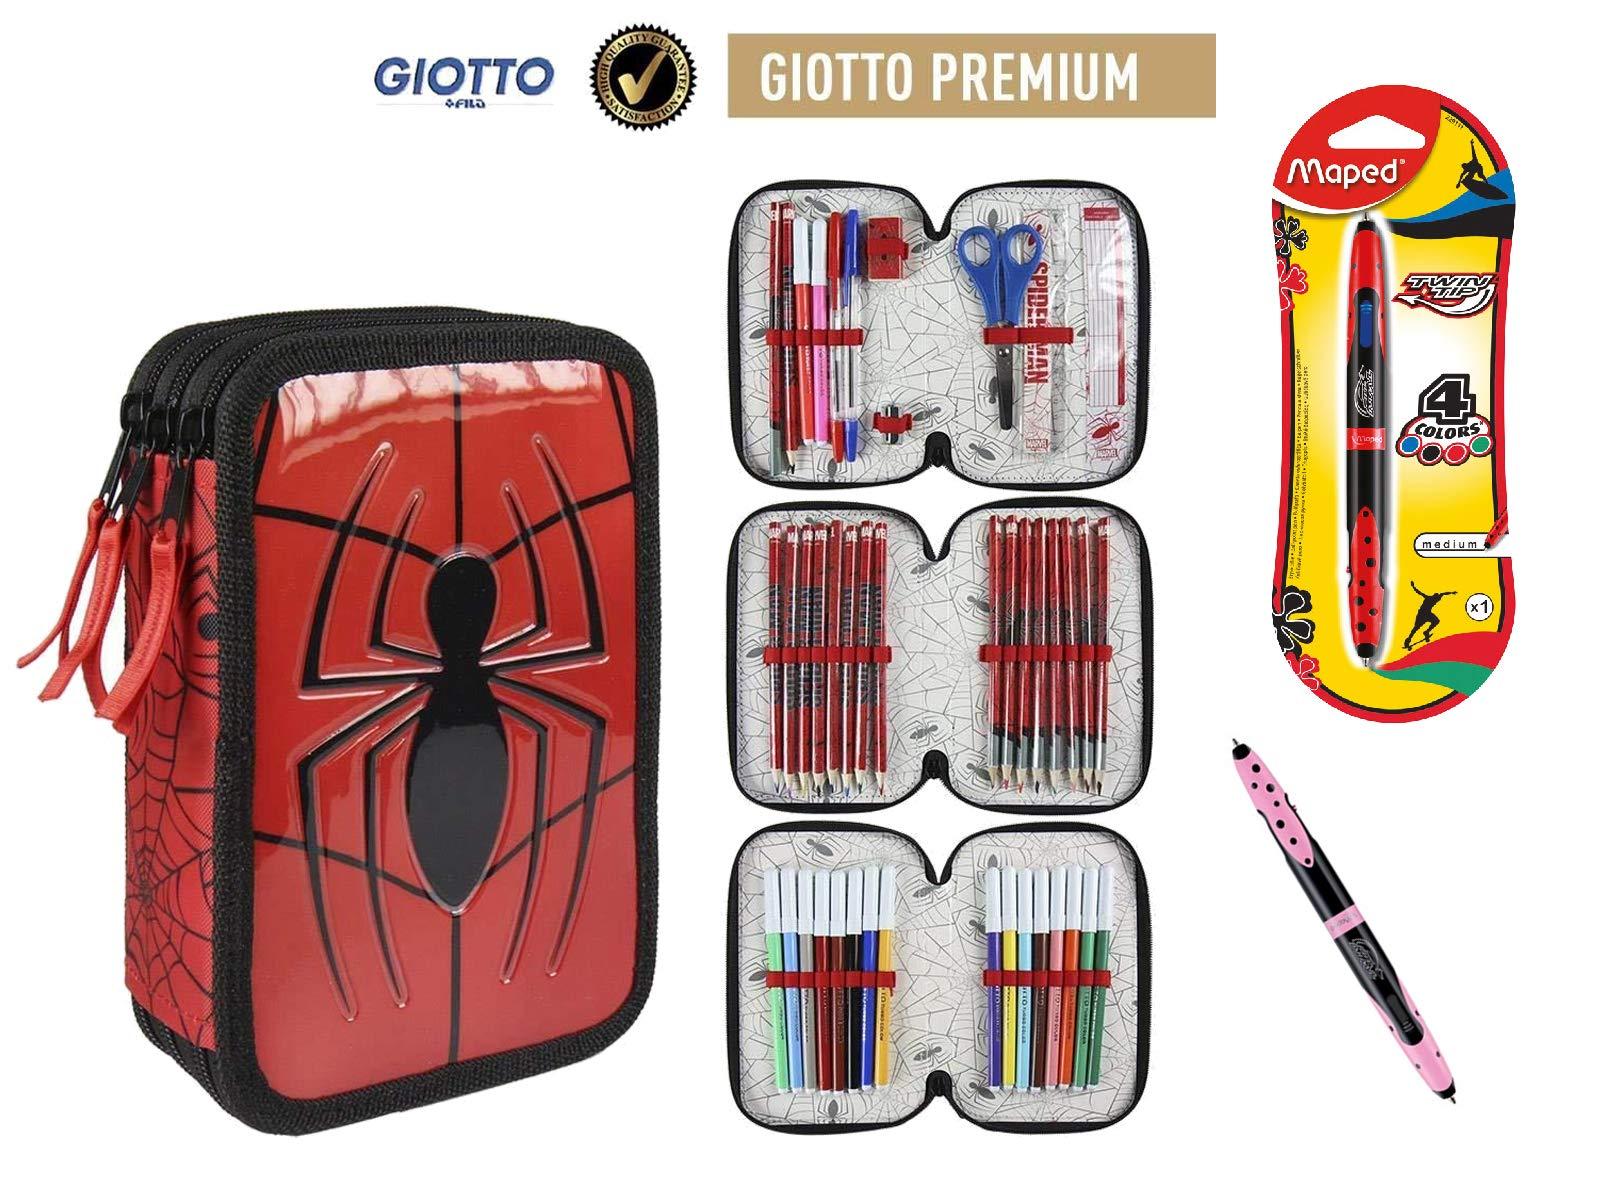 Plumier Estuche Premium de Cremallera Triple 3 Pisos Spiderman Marvel – 43 Piezas Contenido Giotto + Regalo 12 Ceras Alpino Plastialpino